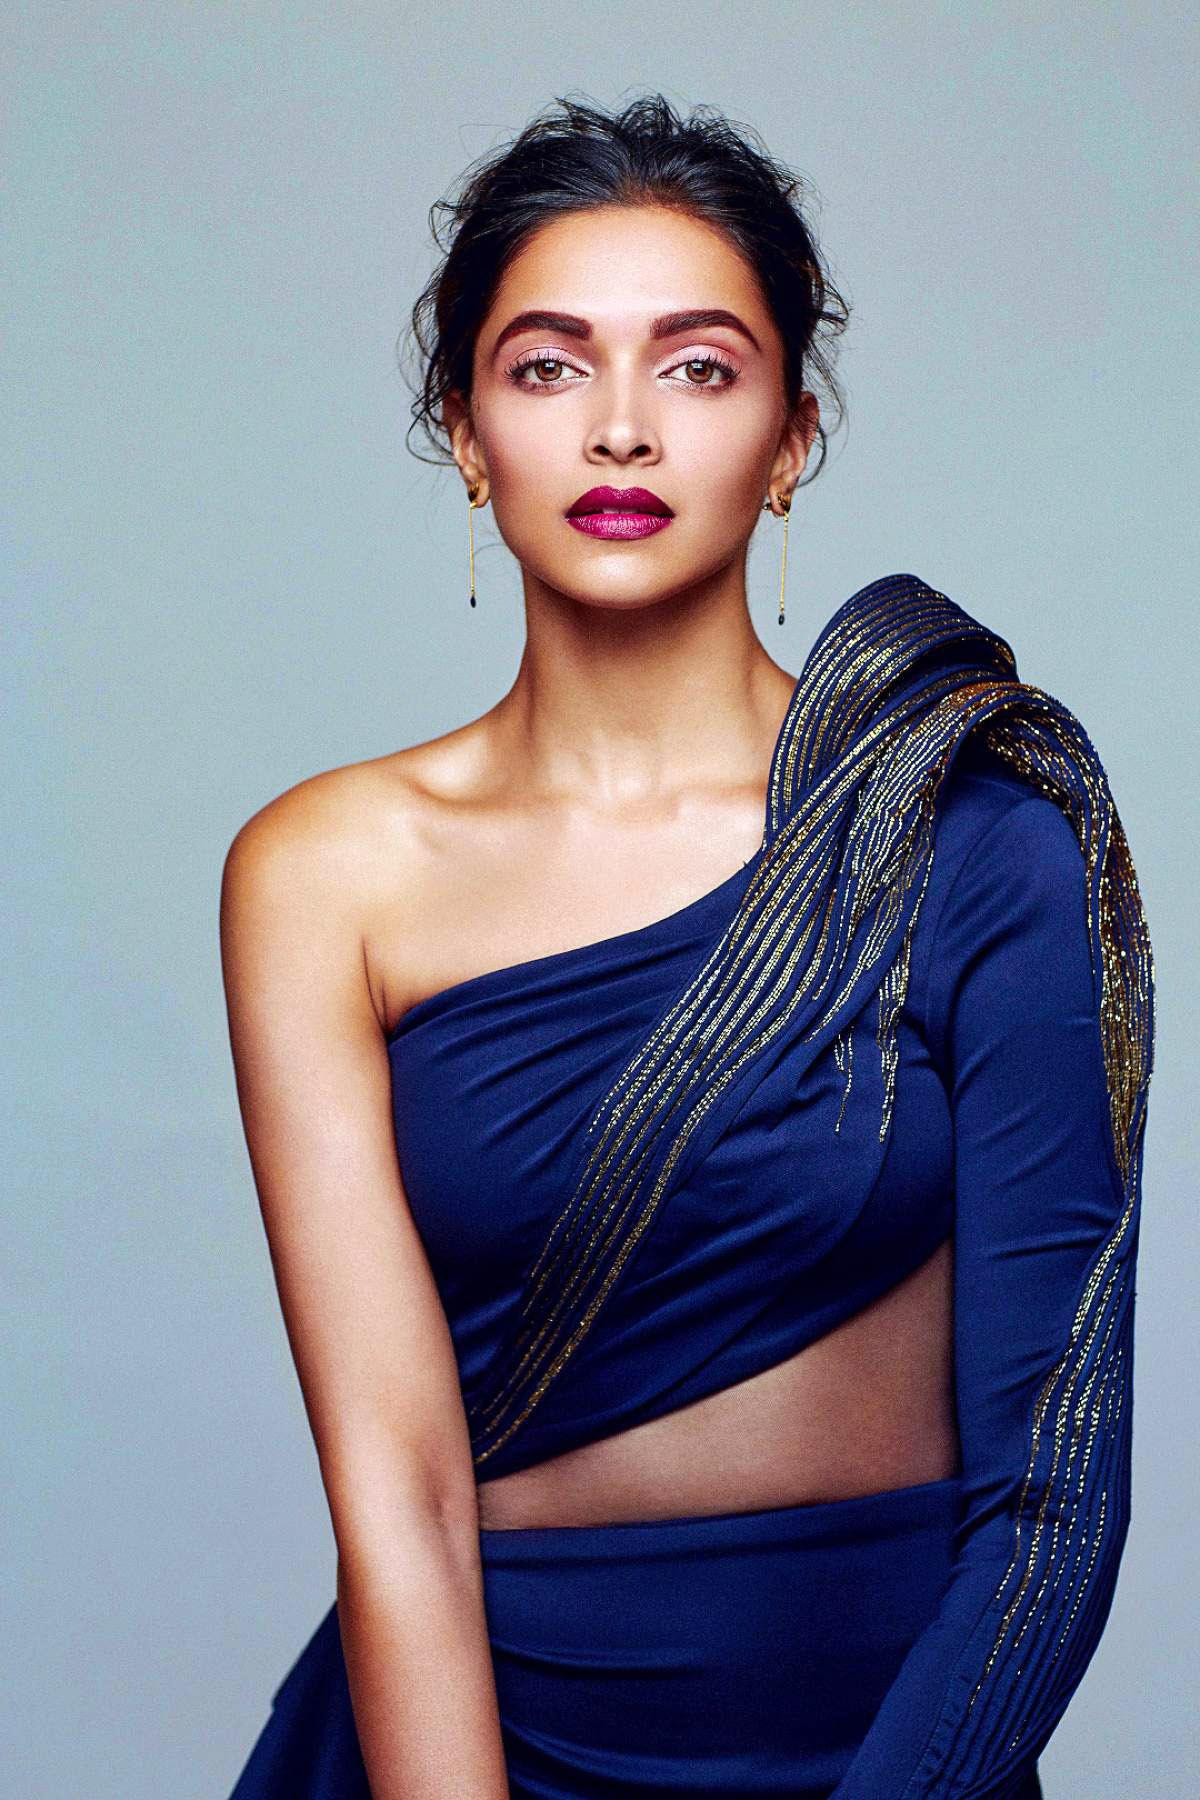 Deepika Padukone Elle Magazine2016 December Photoshoot